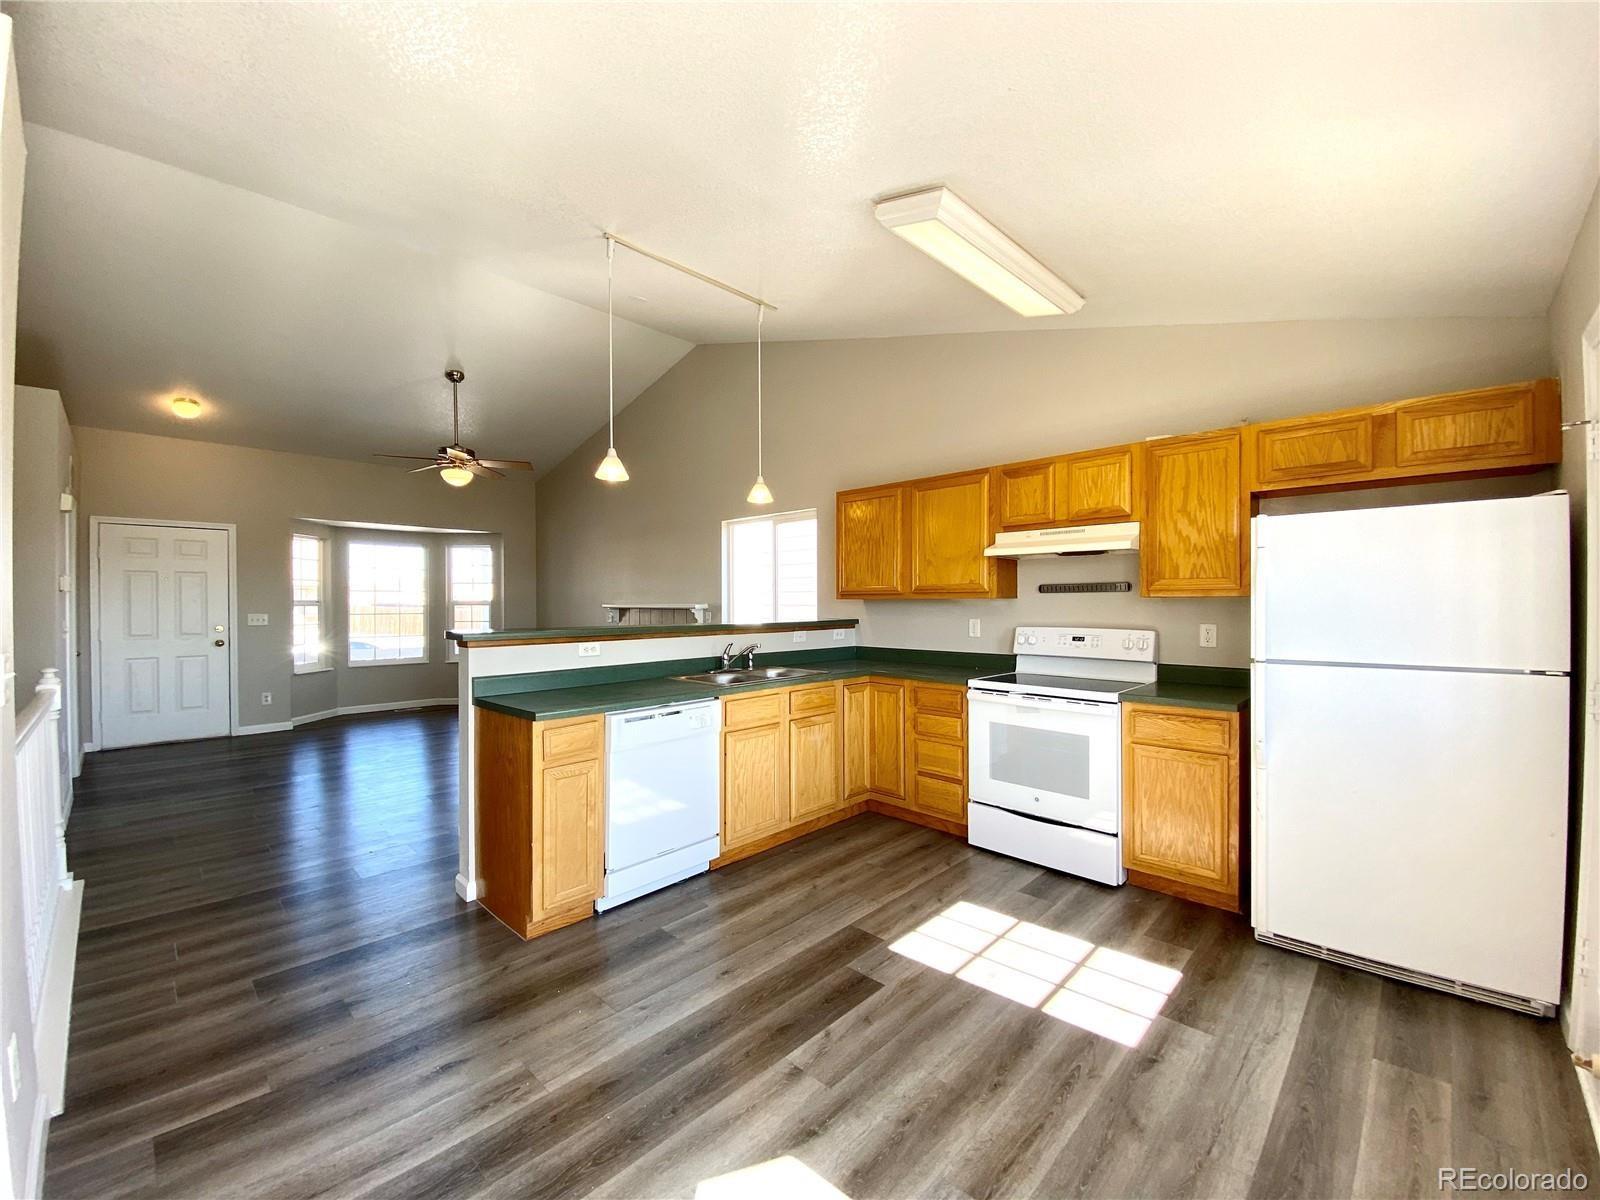 MLS# 6788673 - 5 - 5311 Suburban , Colorado Springs, CO 80911